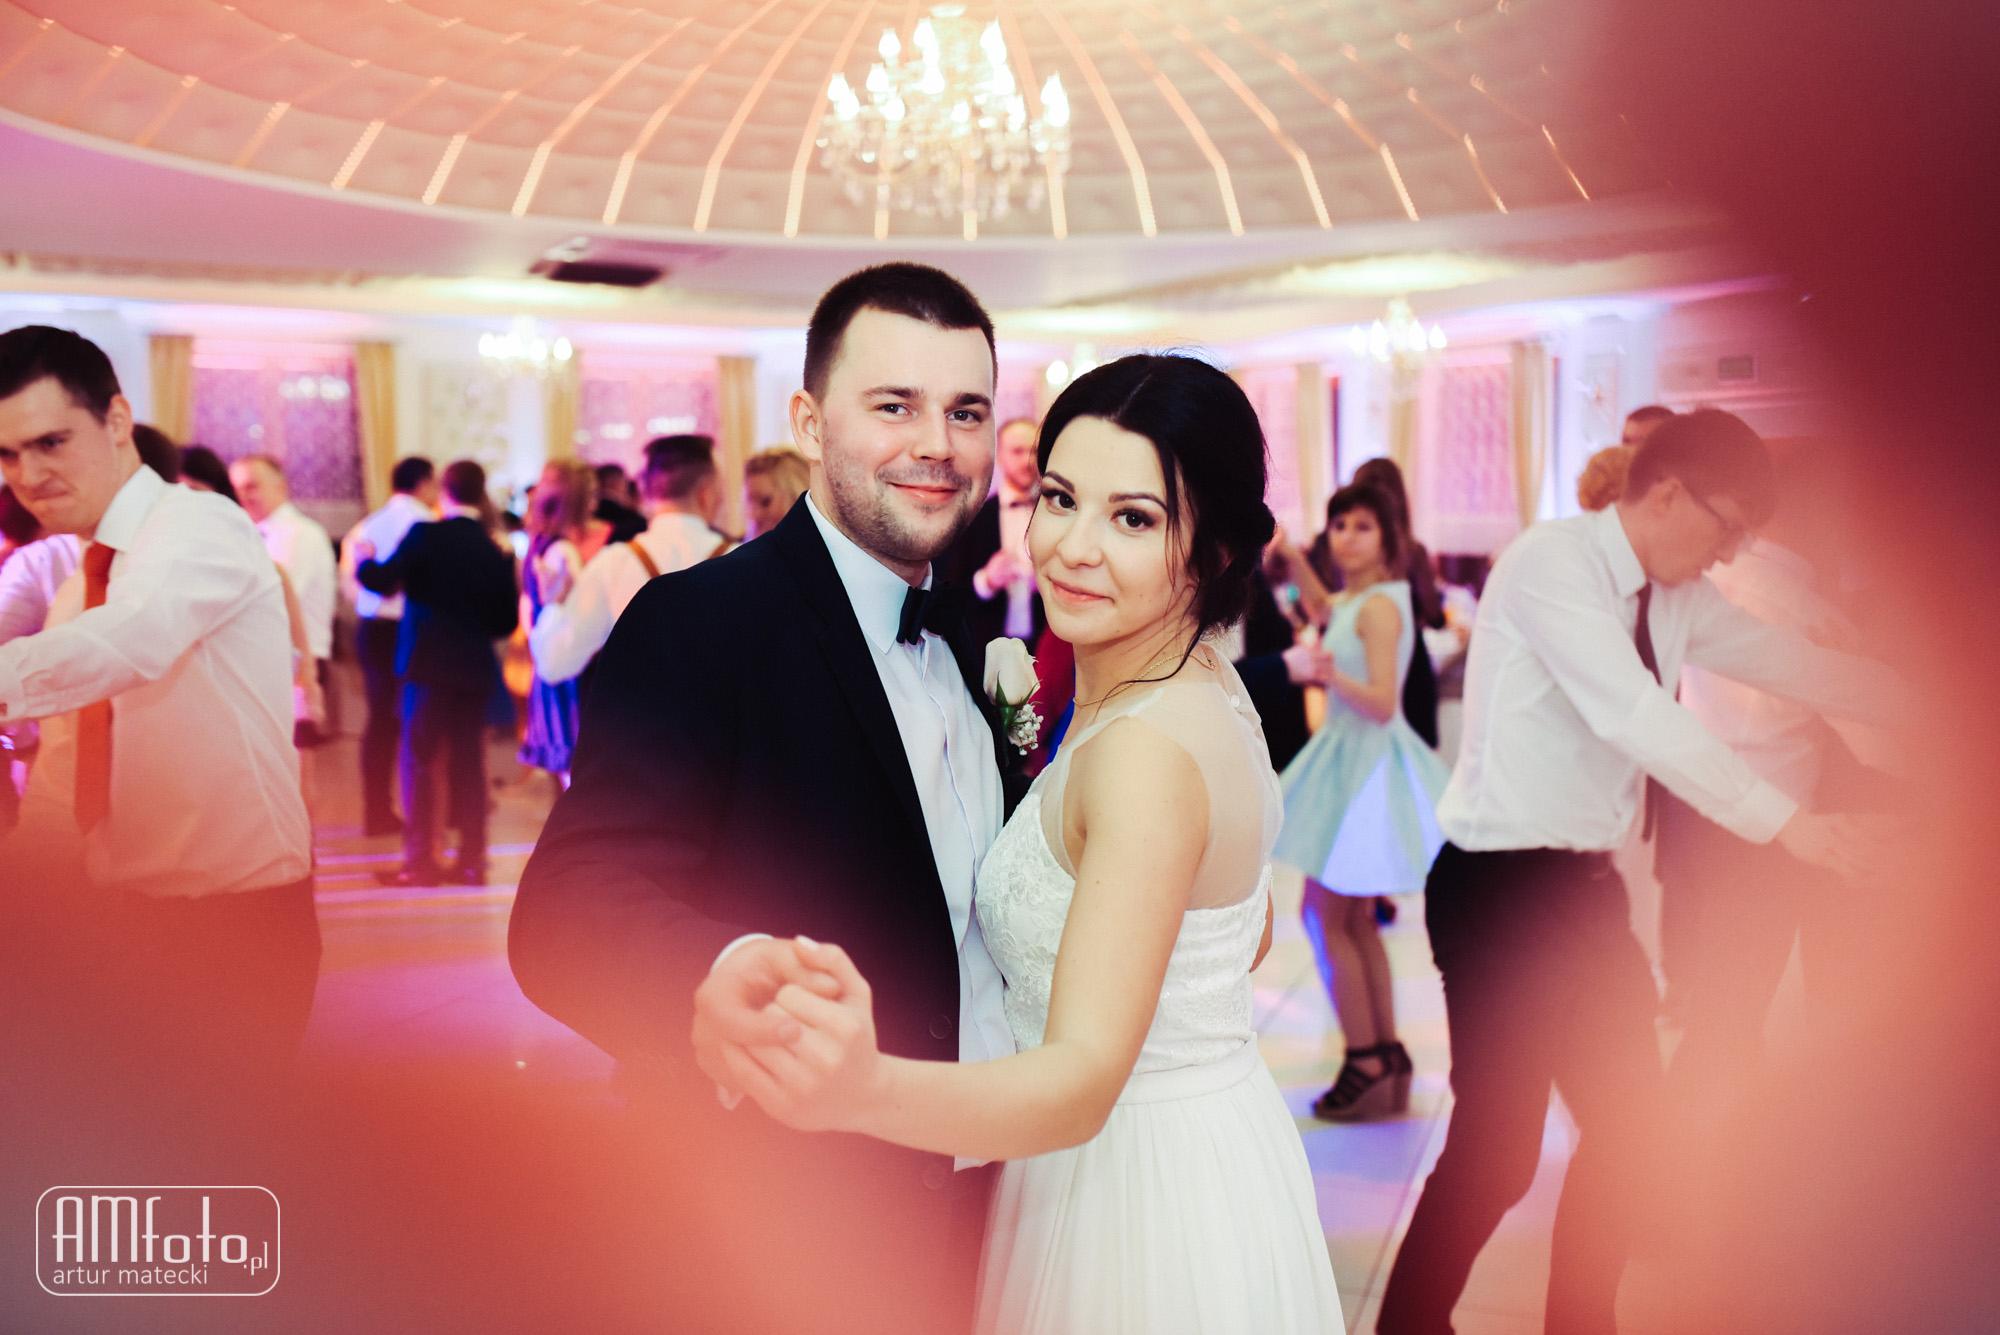 Inez&Sebastian __reportaz_____www_amfoto_pl___-3558.jpg